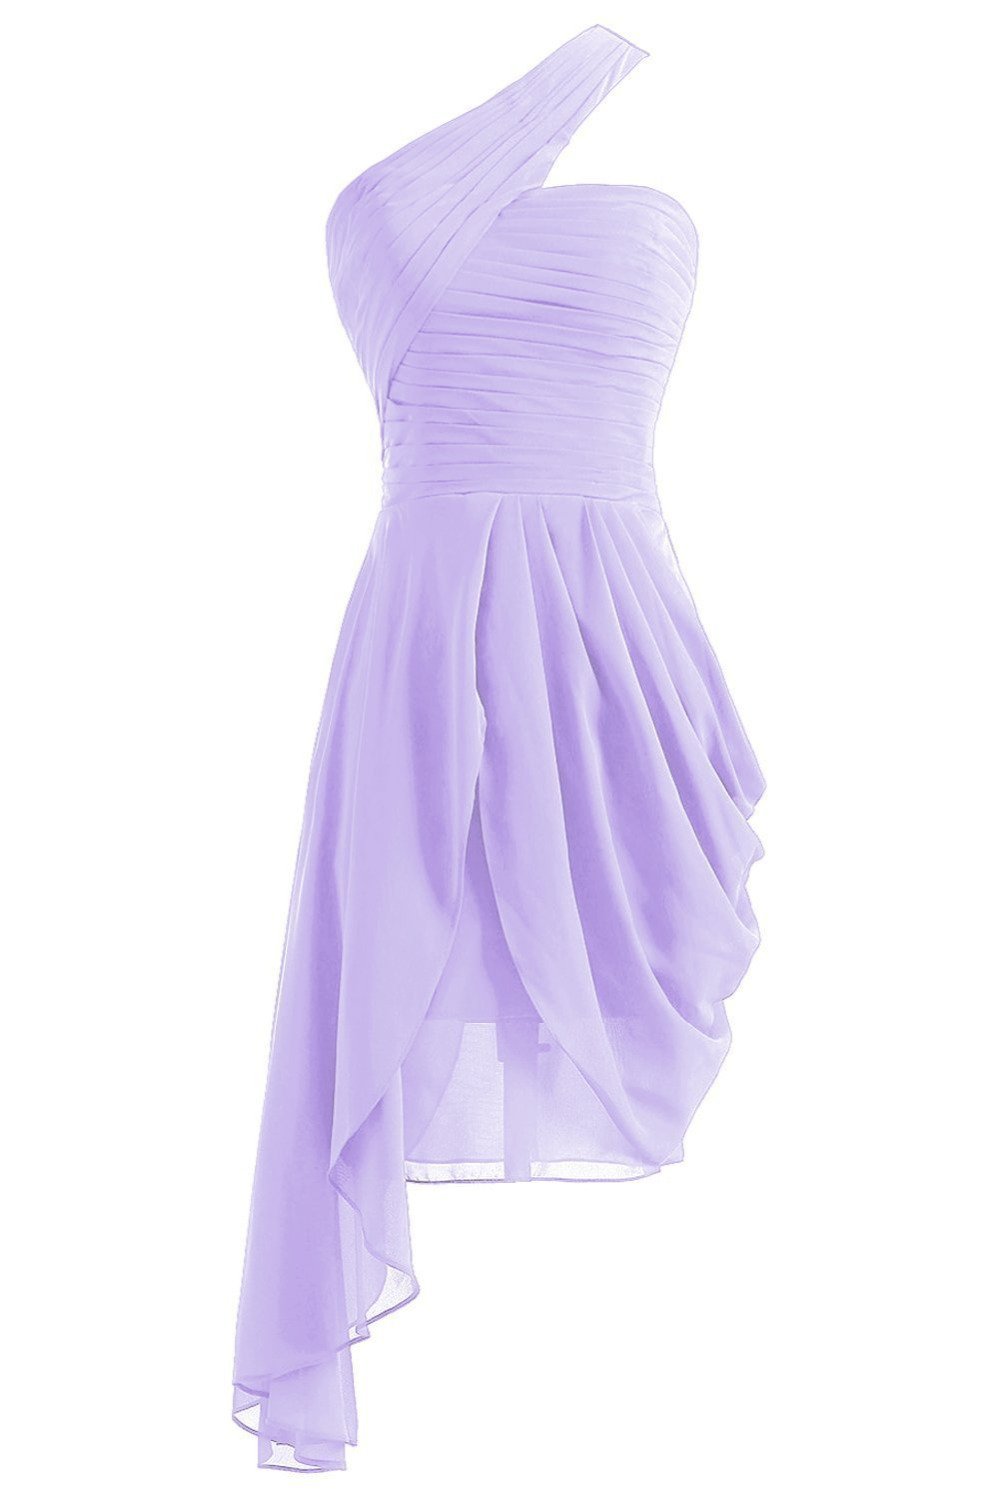 Bridesmaid Dresses Knee Length Short Formal Party Abendkleider Chiffon 16 Color Bridesmaid Gown Robe De Soiree